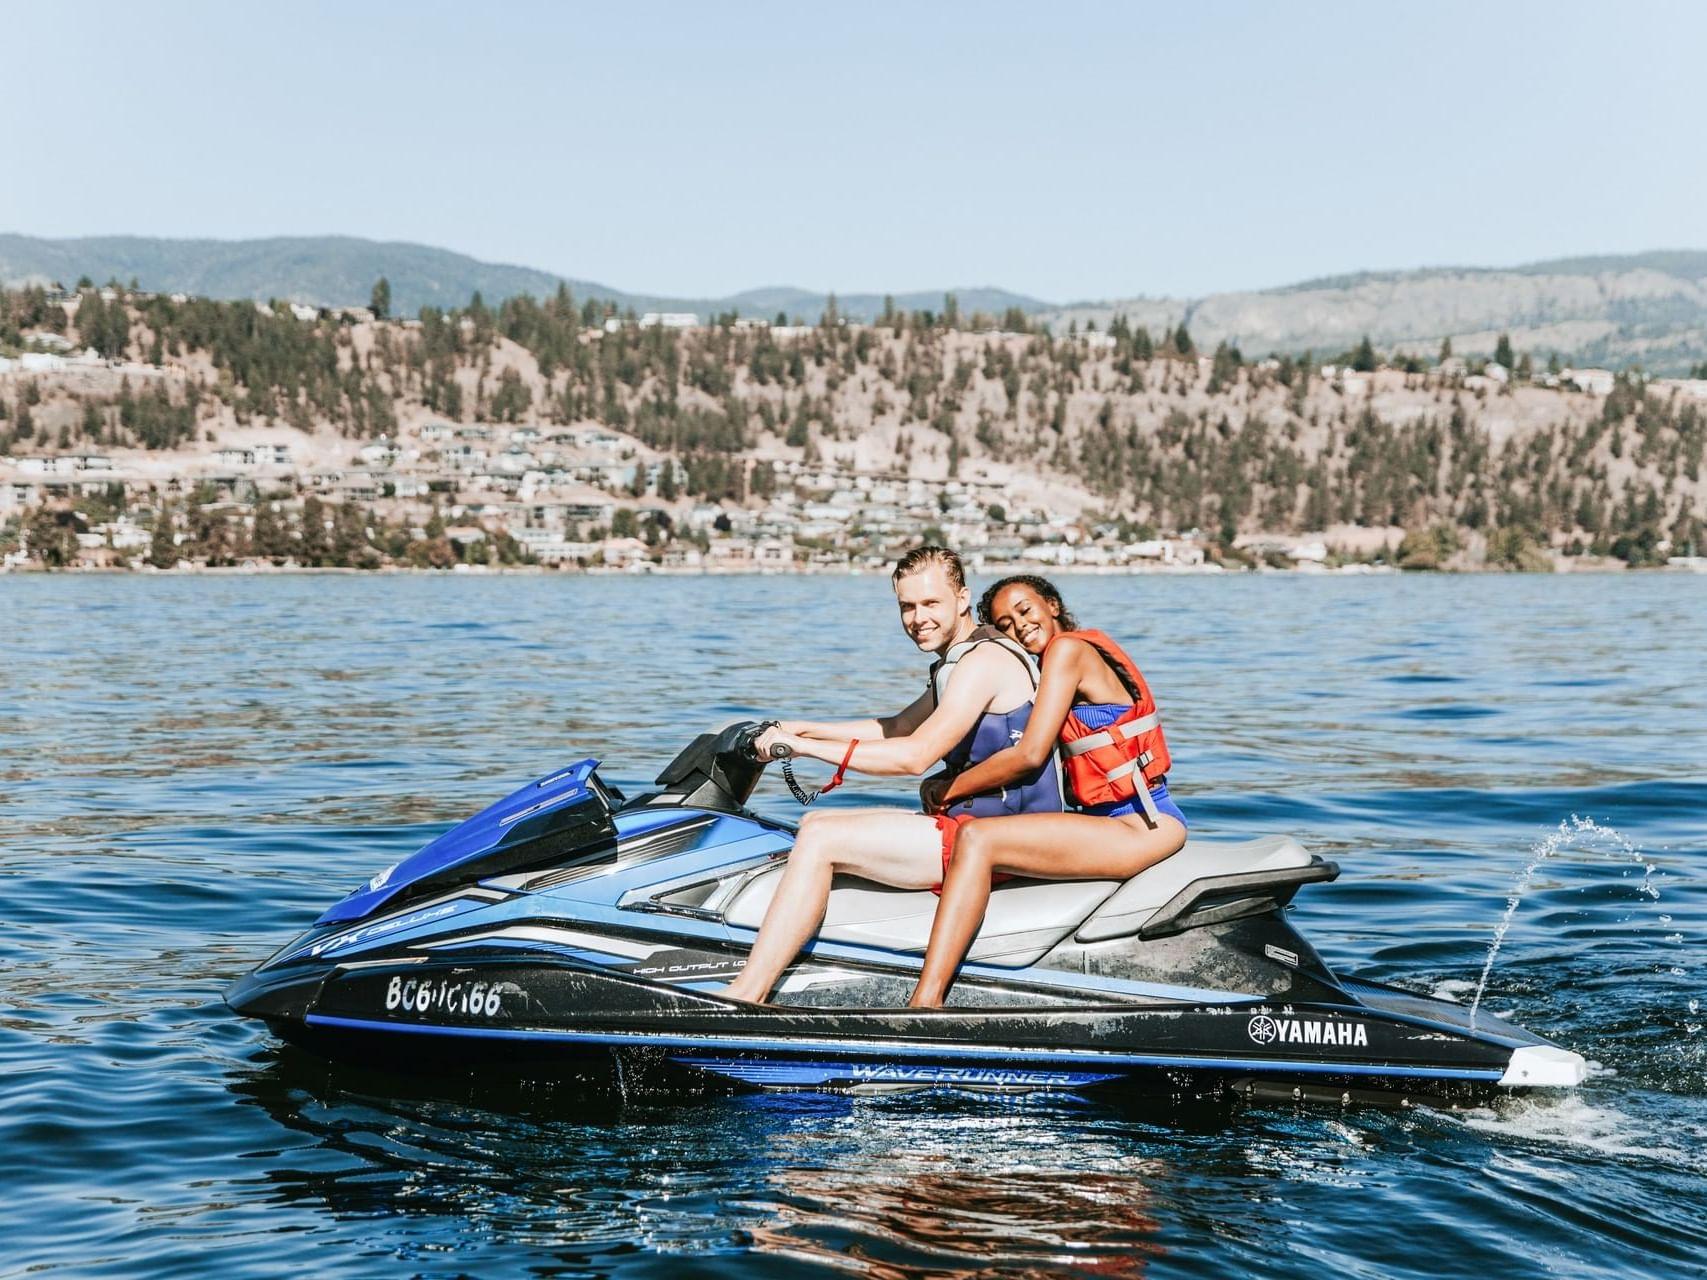 A couple on a jet ski near Manteo Resort